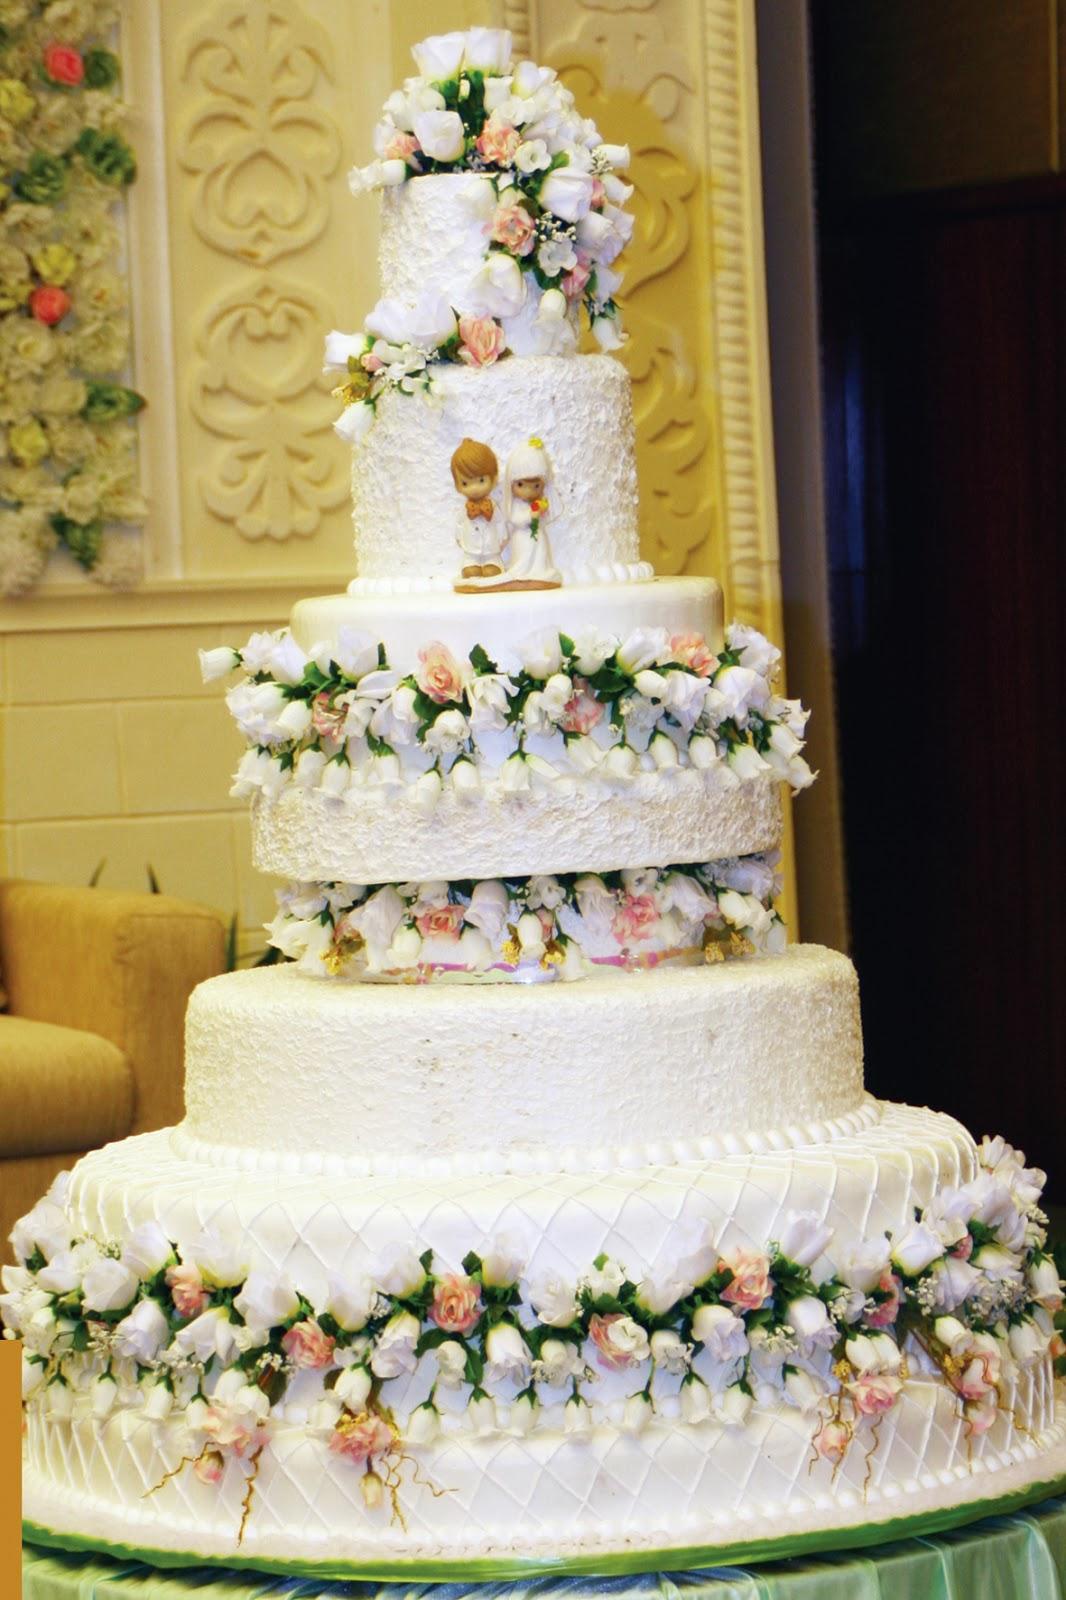 lia event wedding package design your wedding cake. Black Bedroom Furniture Sets. Home Design Ideas